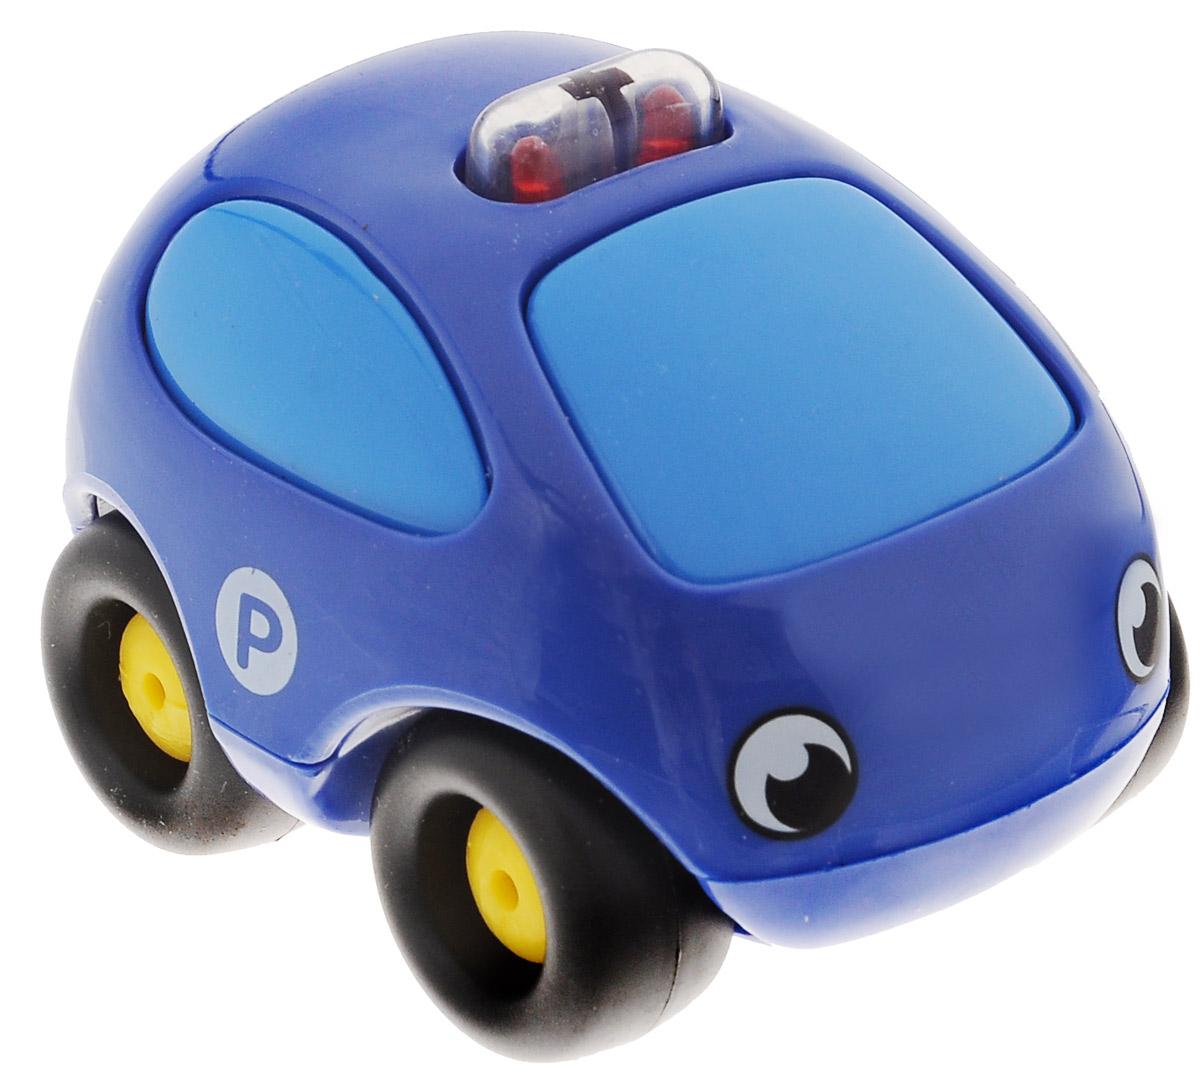 Smoby Машинка Vroom Planet цвет синий smoby машинка vroom planet цвет фиолетовый